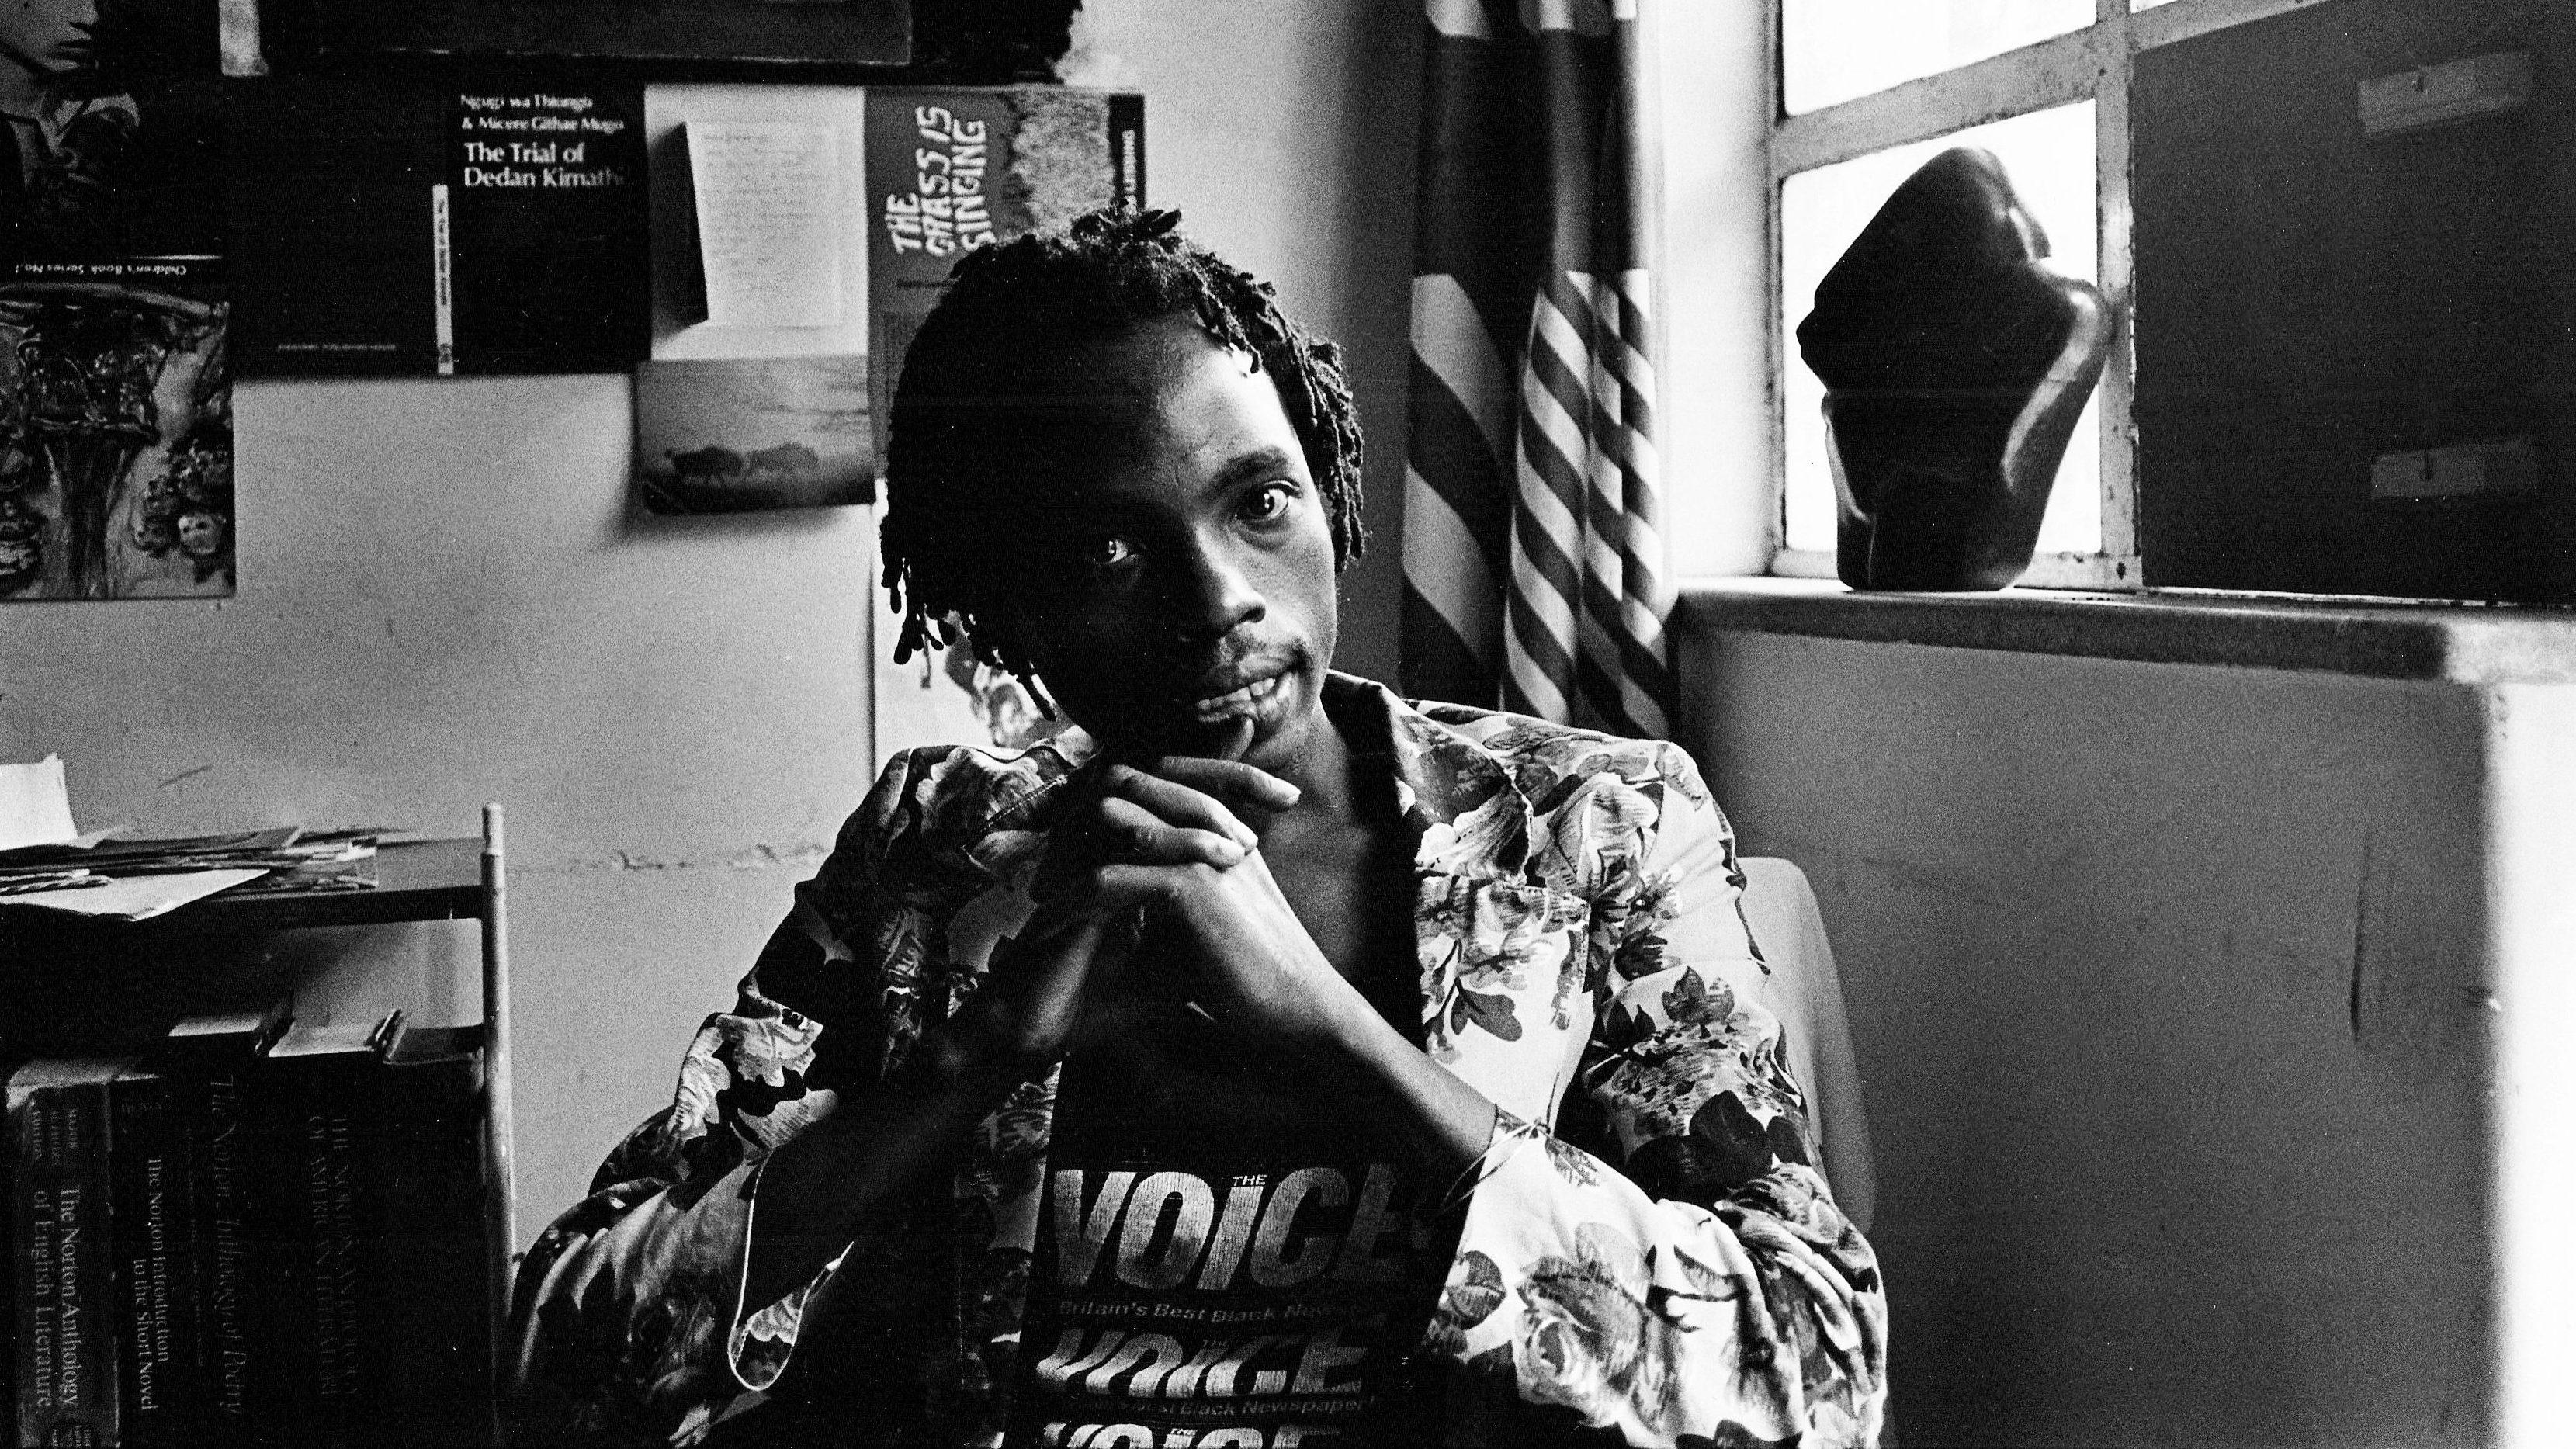 Dambudzo Marechera in his flat at 8 Sloane Court, Harare, March 1986